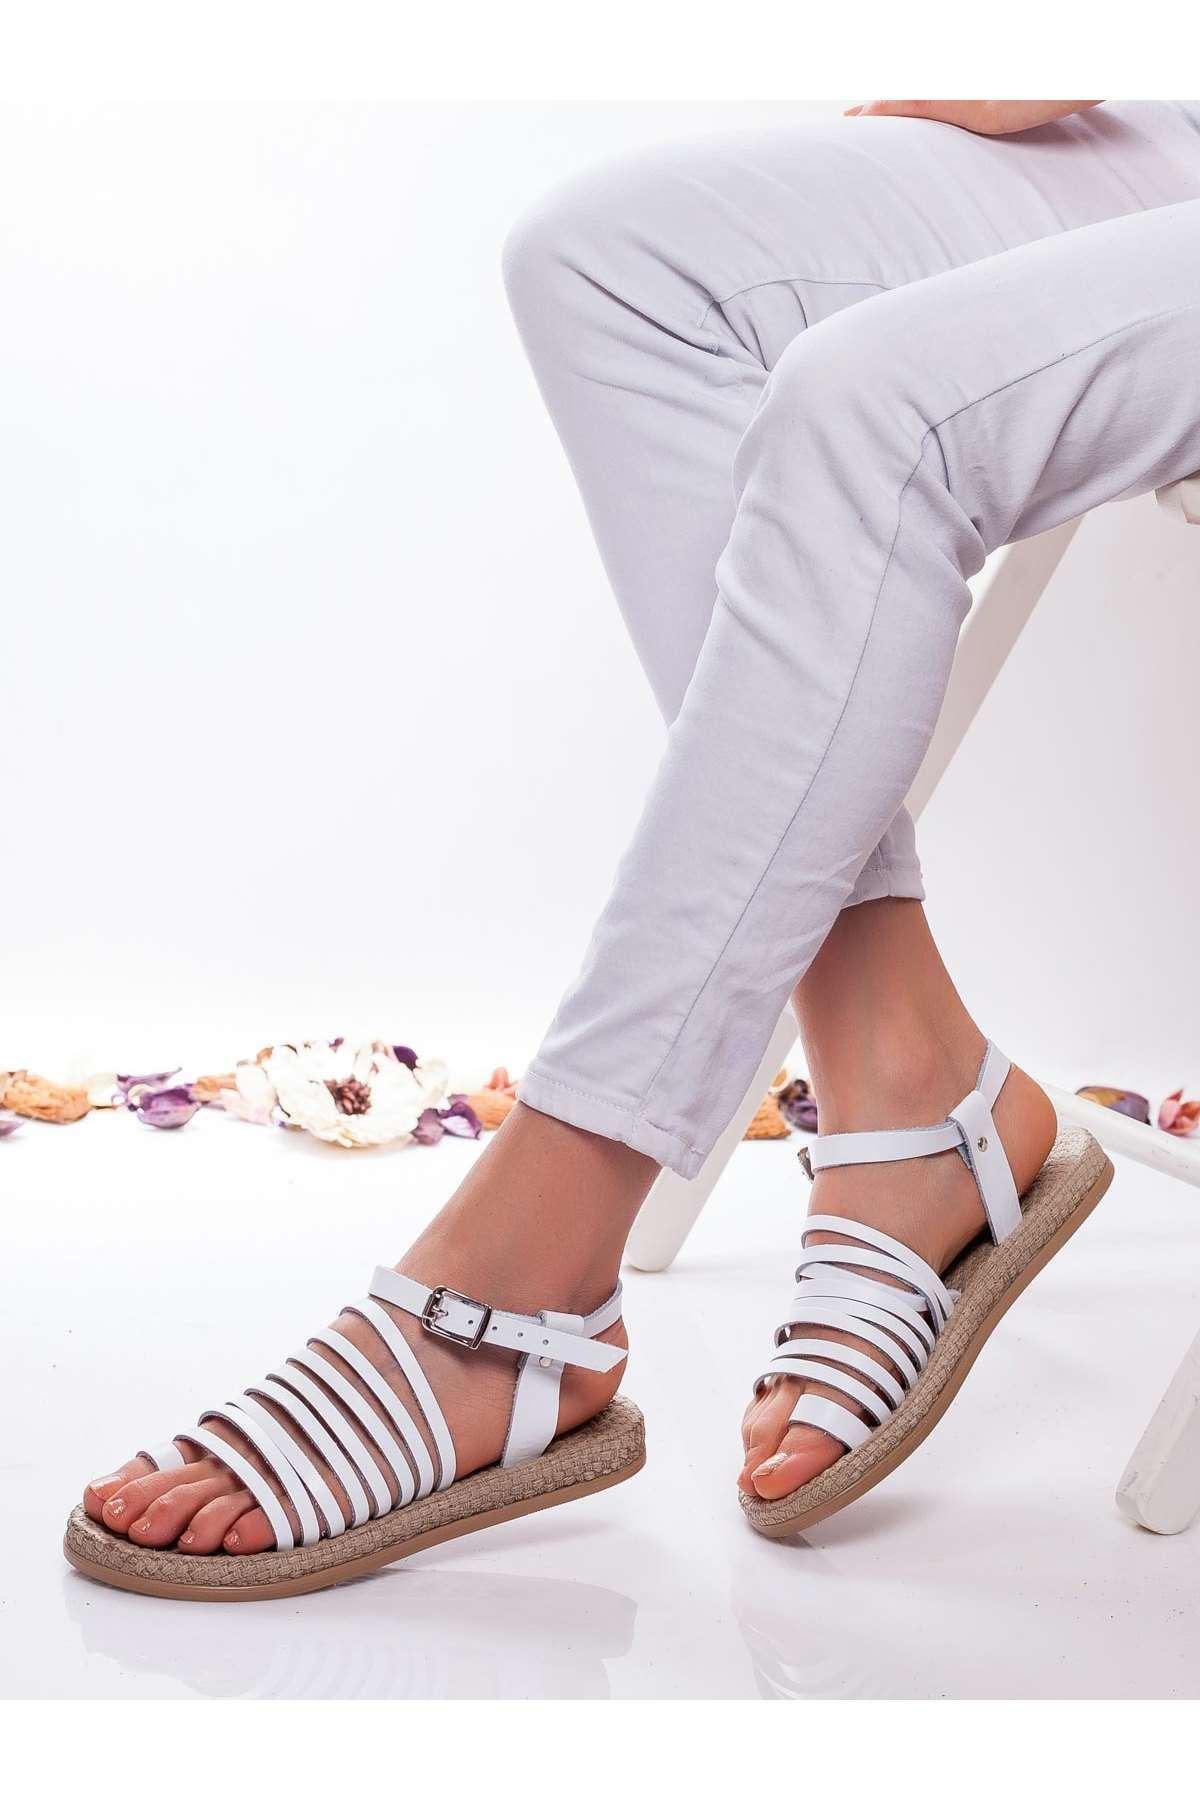 Clair Hakiki Deri Sandalet BEYAZ